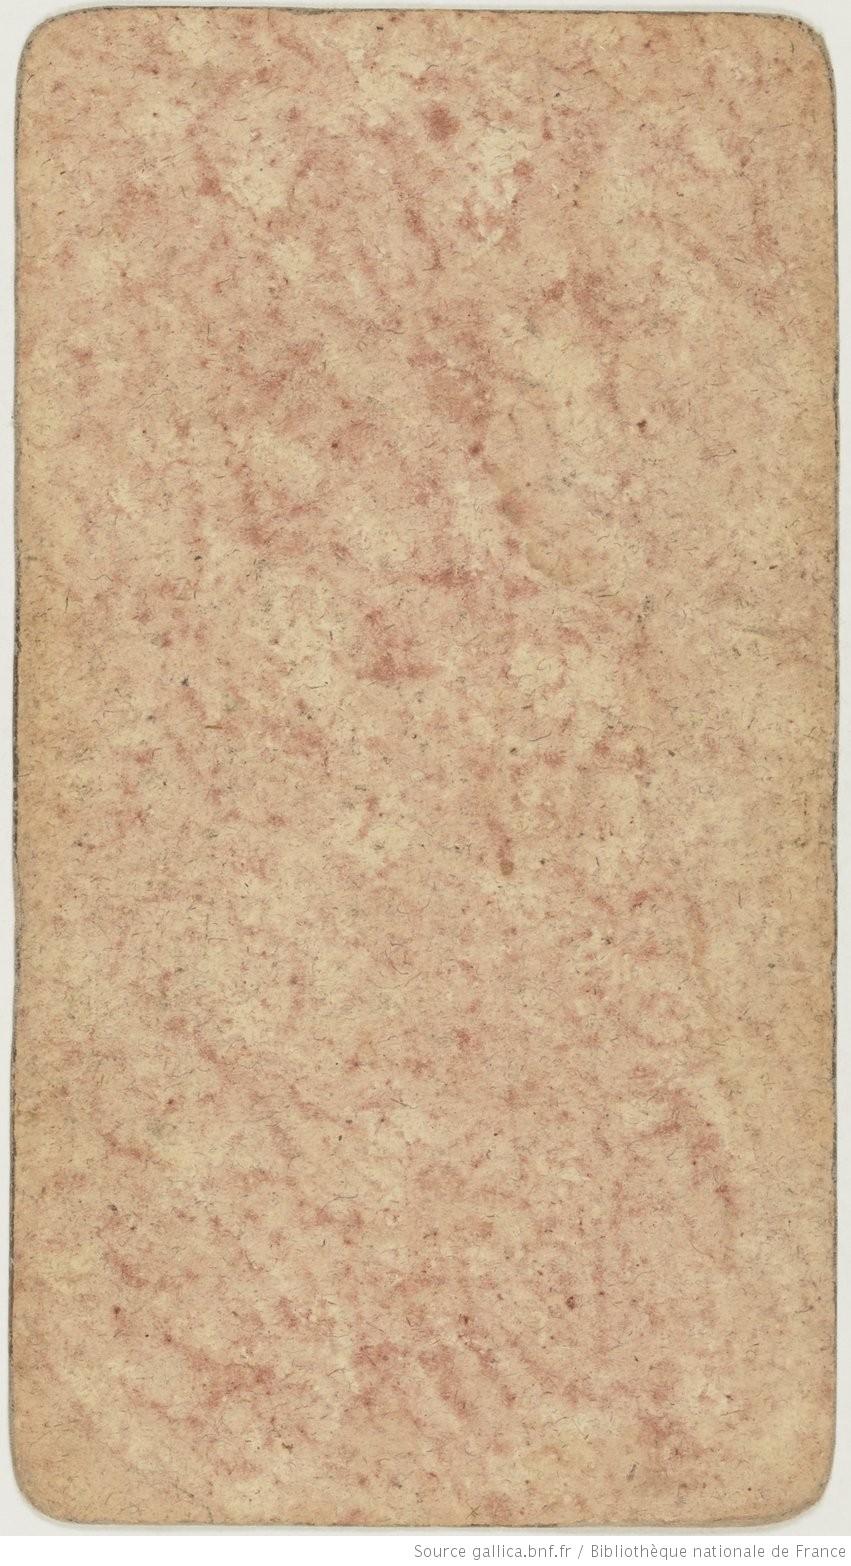 http://gallica.bnf.fr/ark:/12148/btv1b10513882m/f40.highres